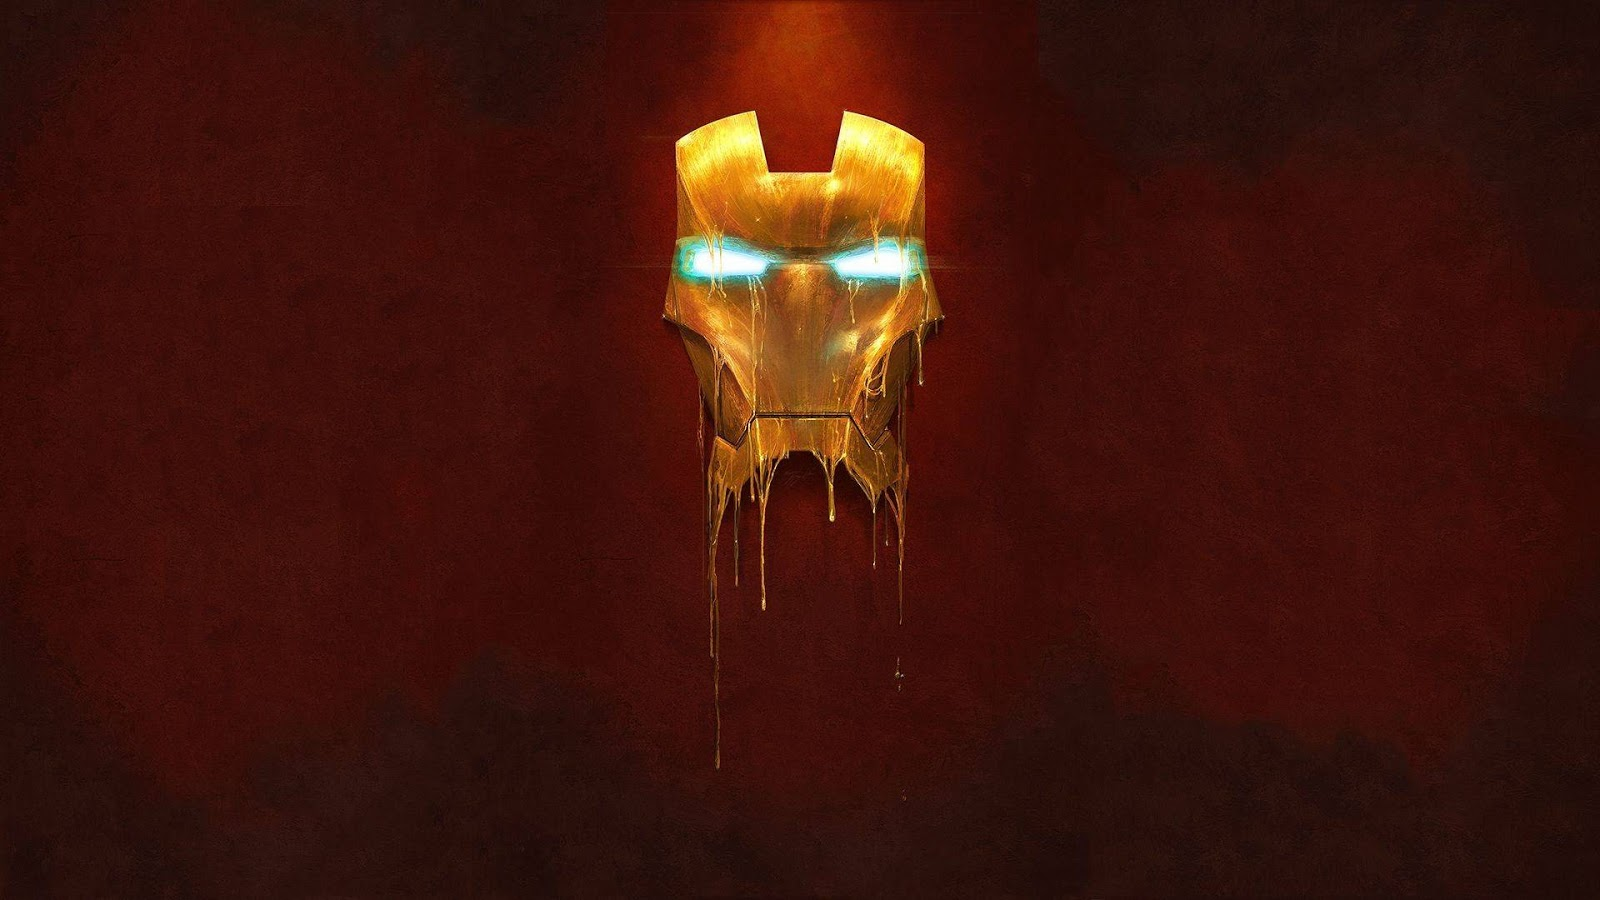 Free download iron man 3 full hd wallpapers free - Iron man cartoon hd ...